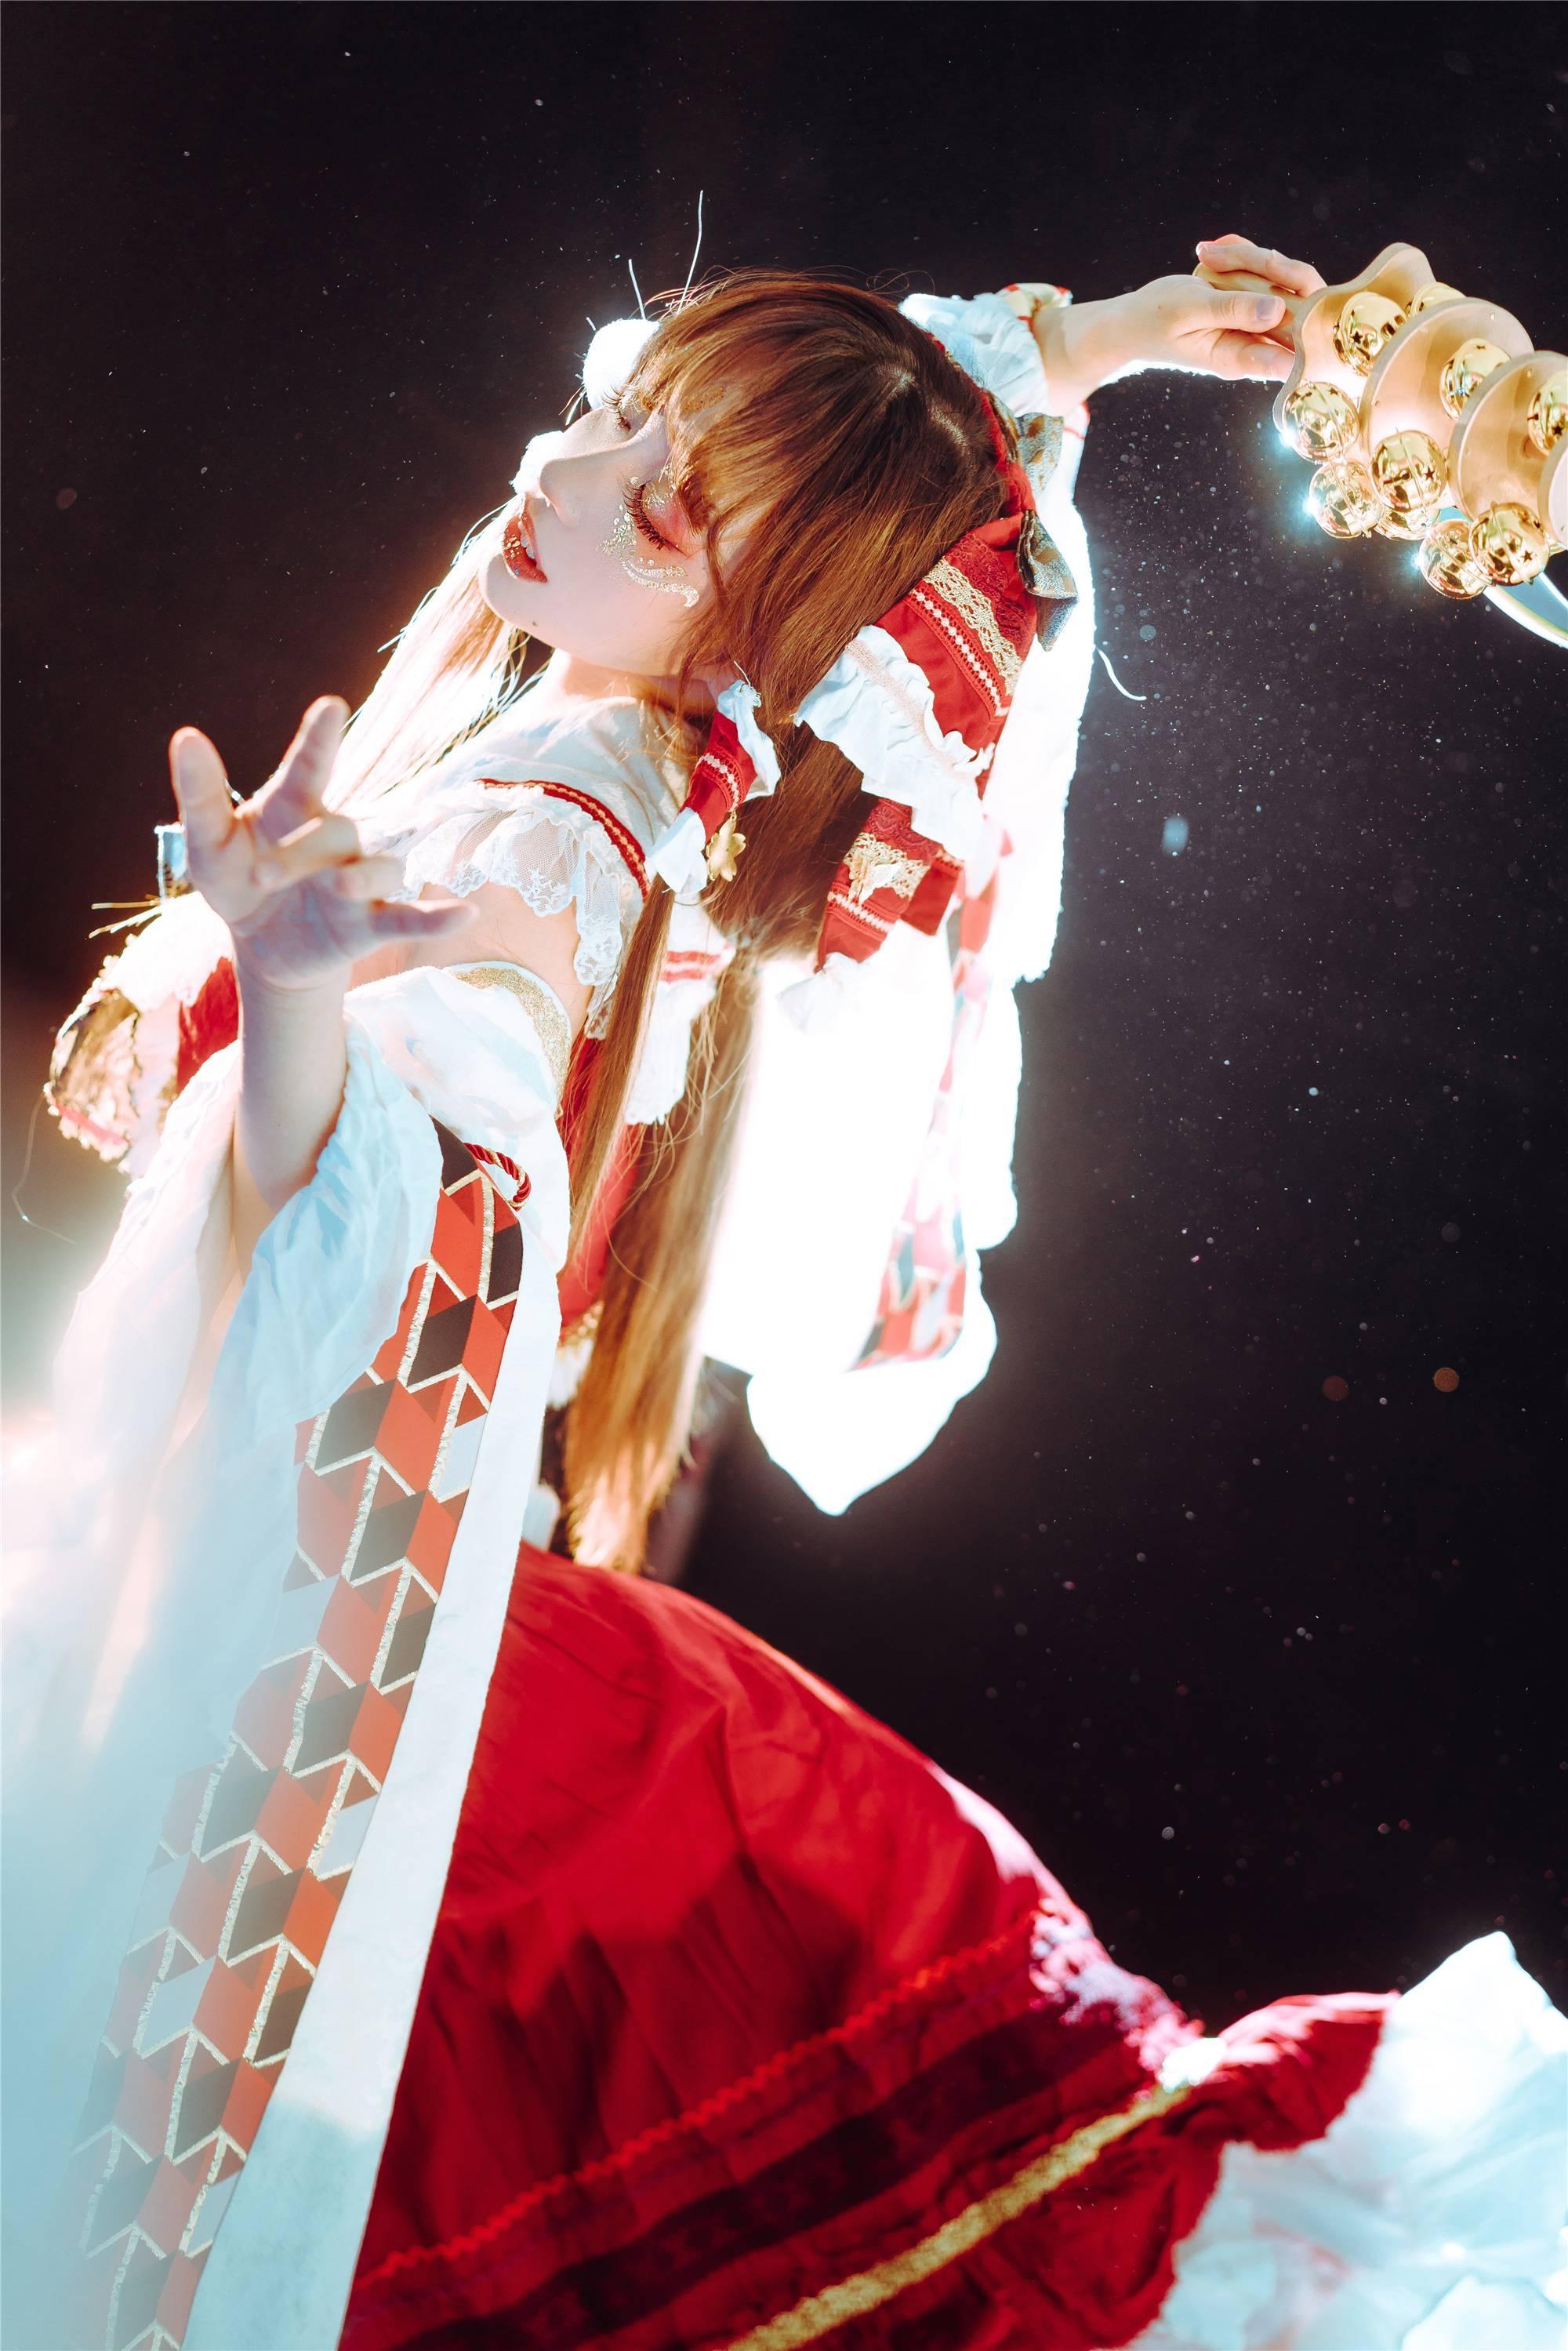 《东方PROJECT》博丽灵梦cosplay【CN:梨梨起床啊】-第1张